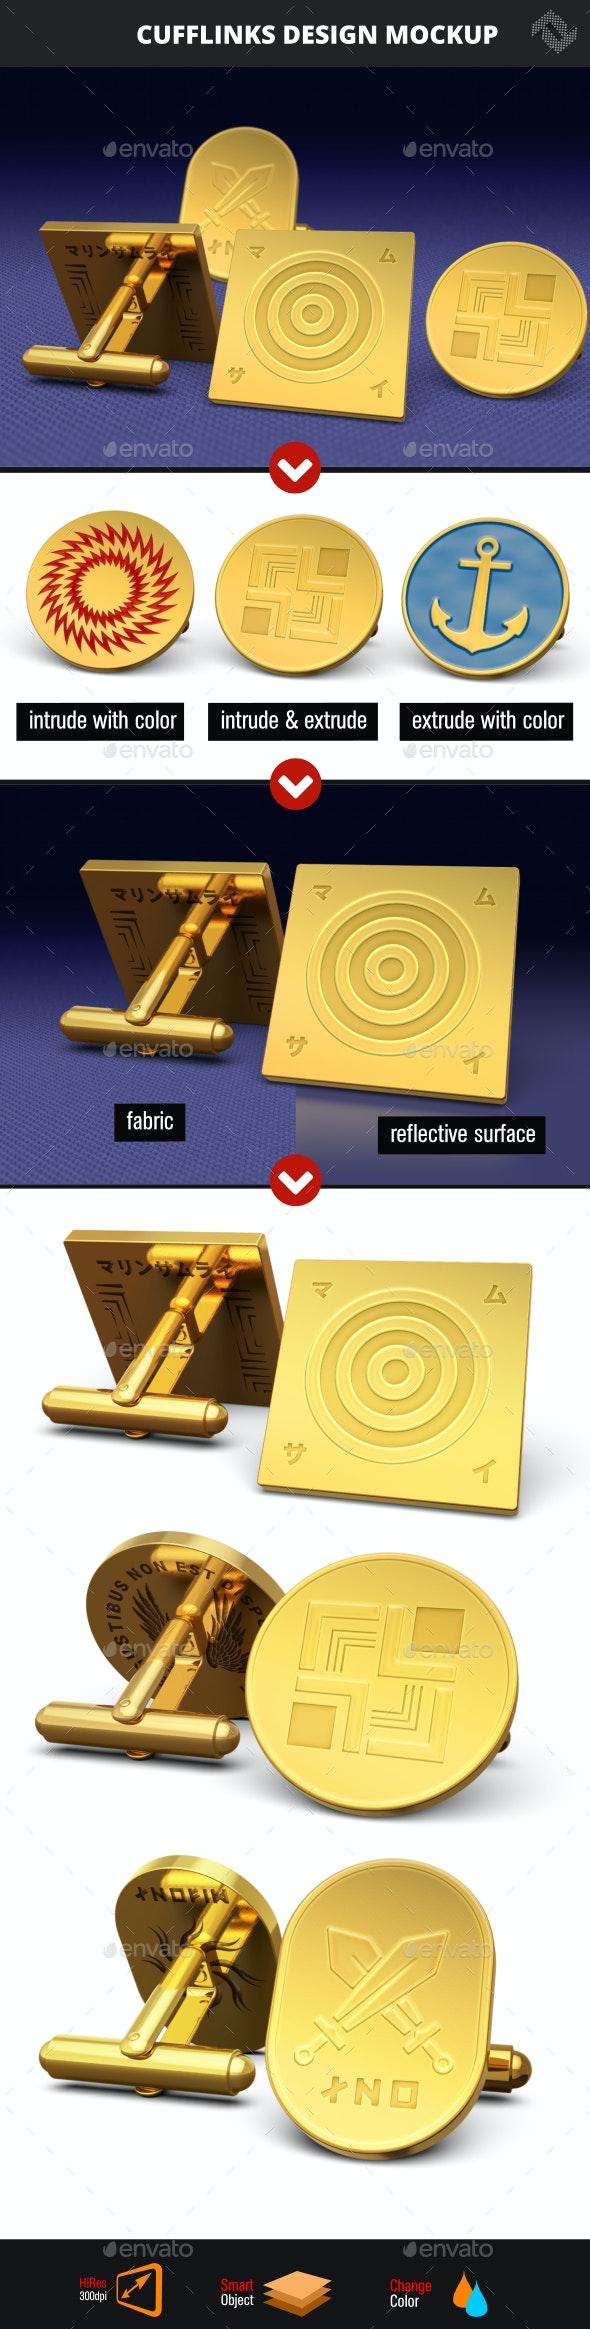 Cufflinks Design Mockup - Product Mock-Ups Graphics